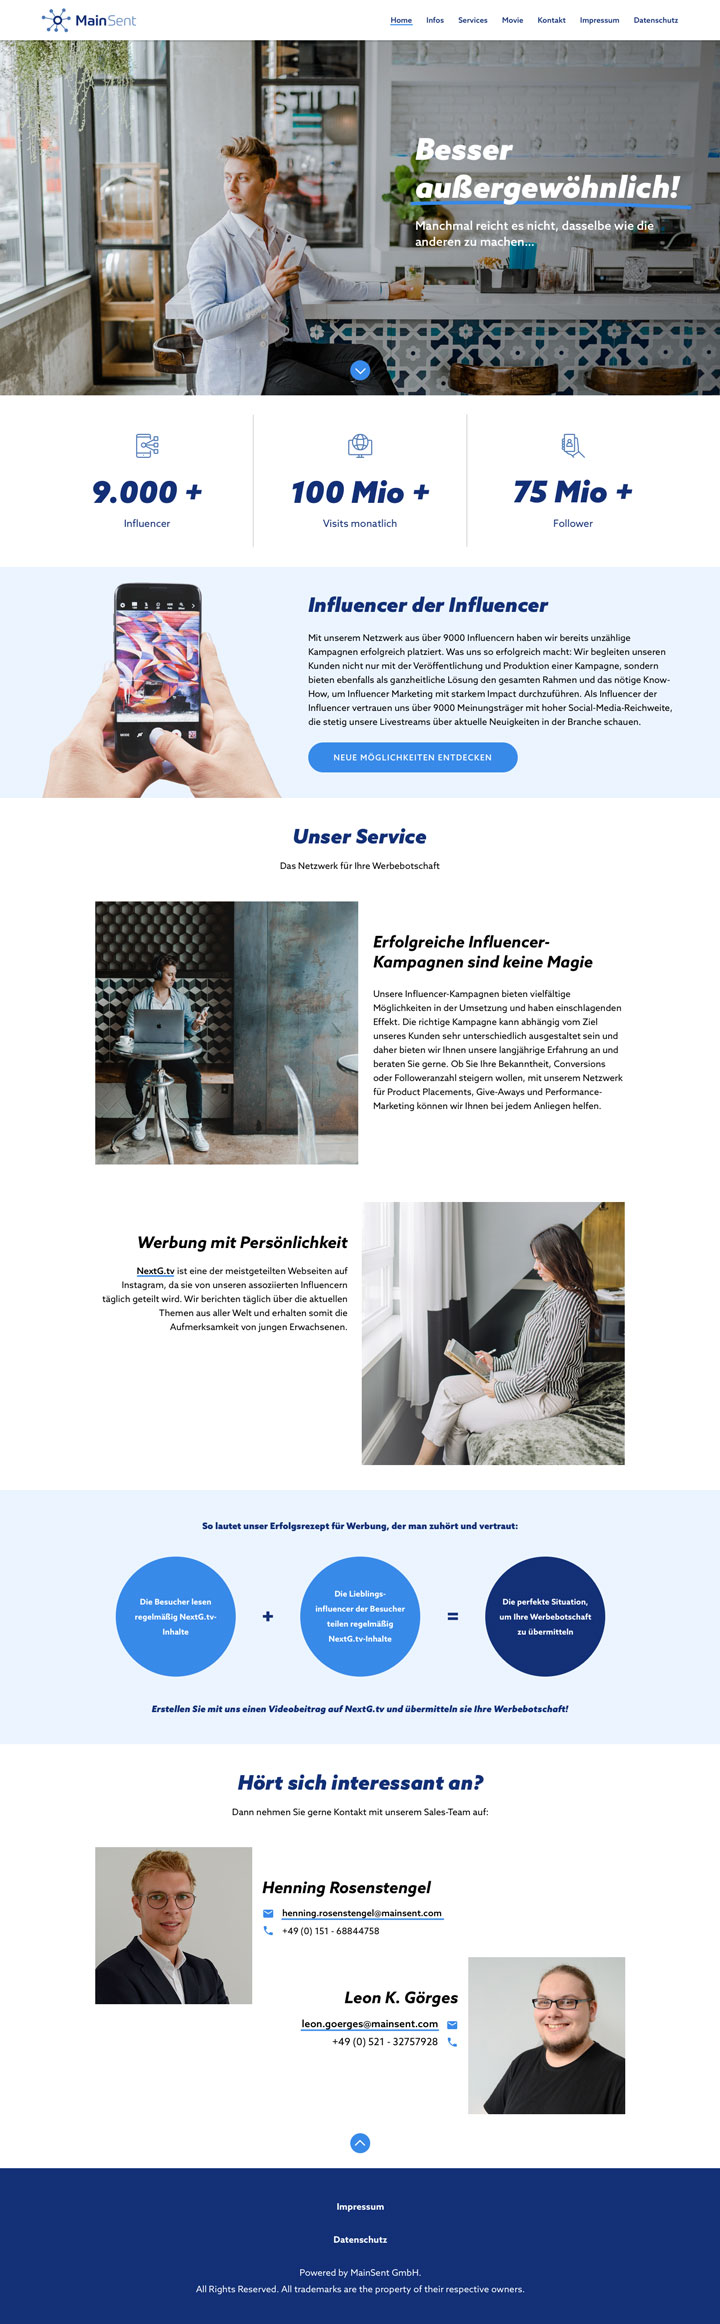 mainsent-onepager-desktop-2